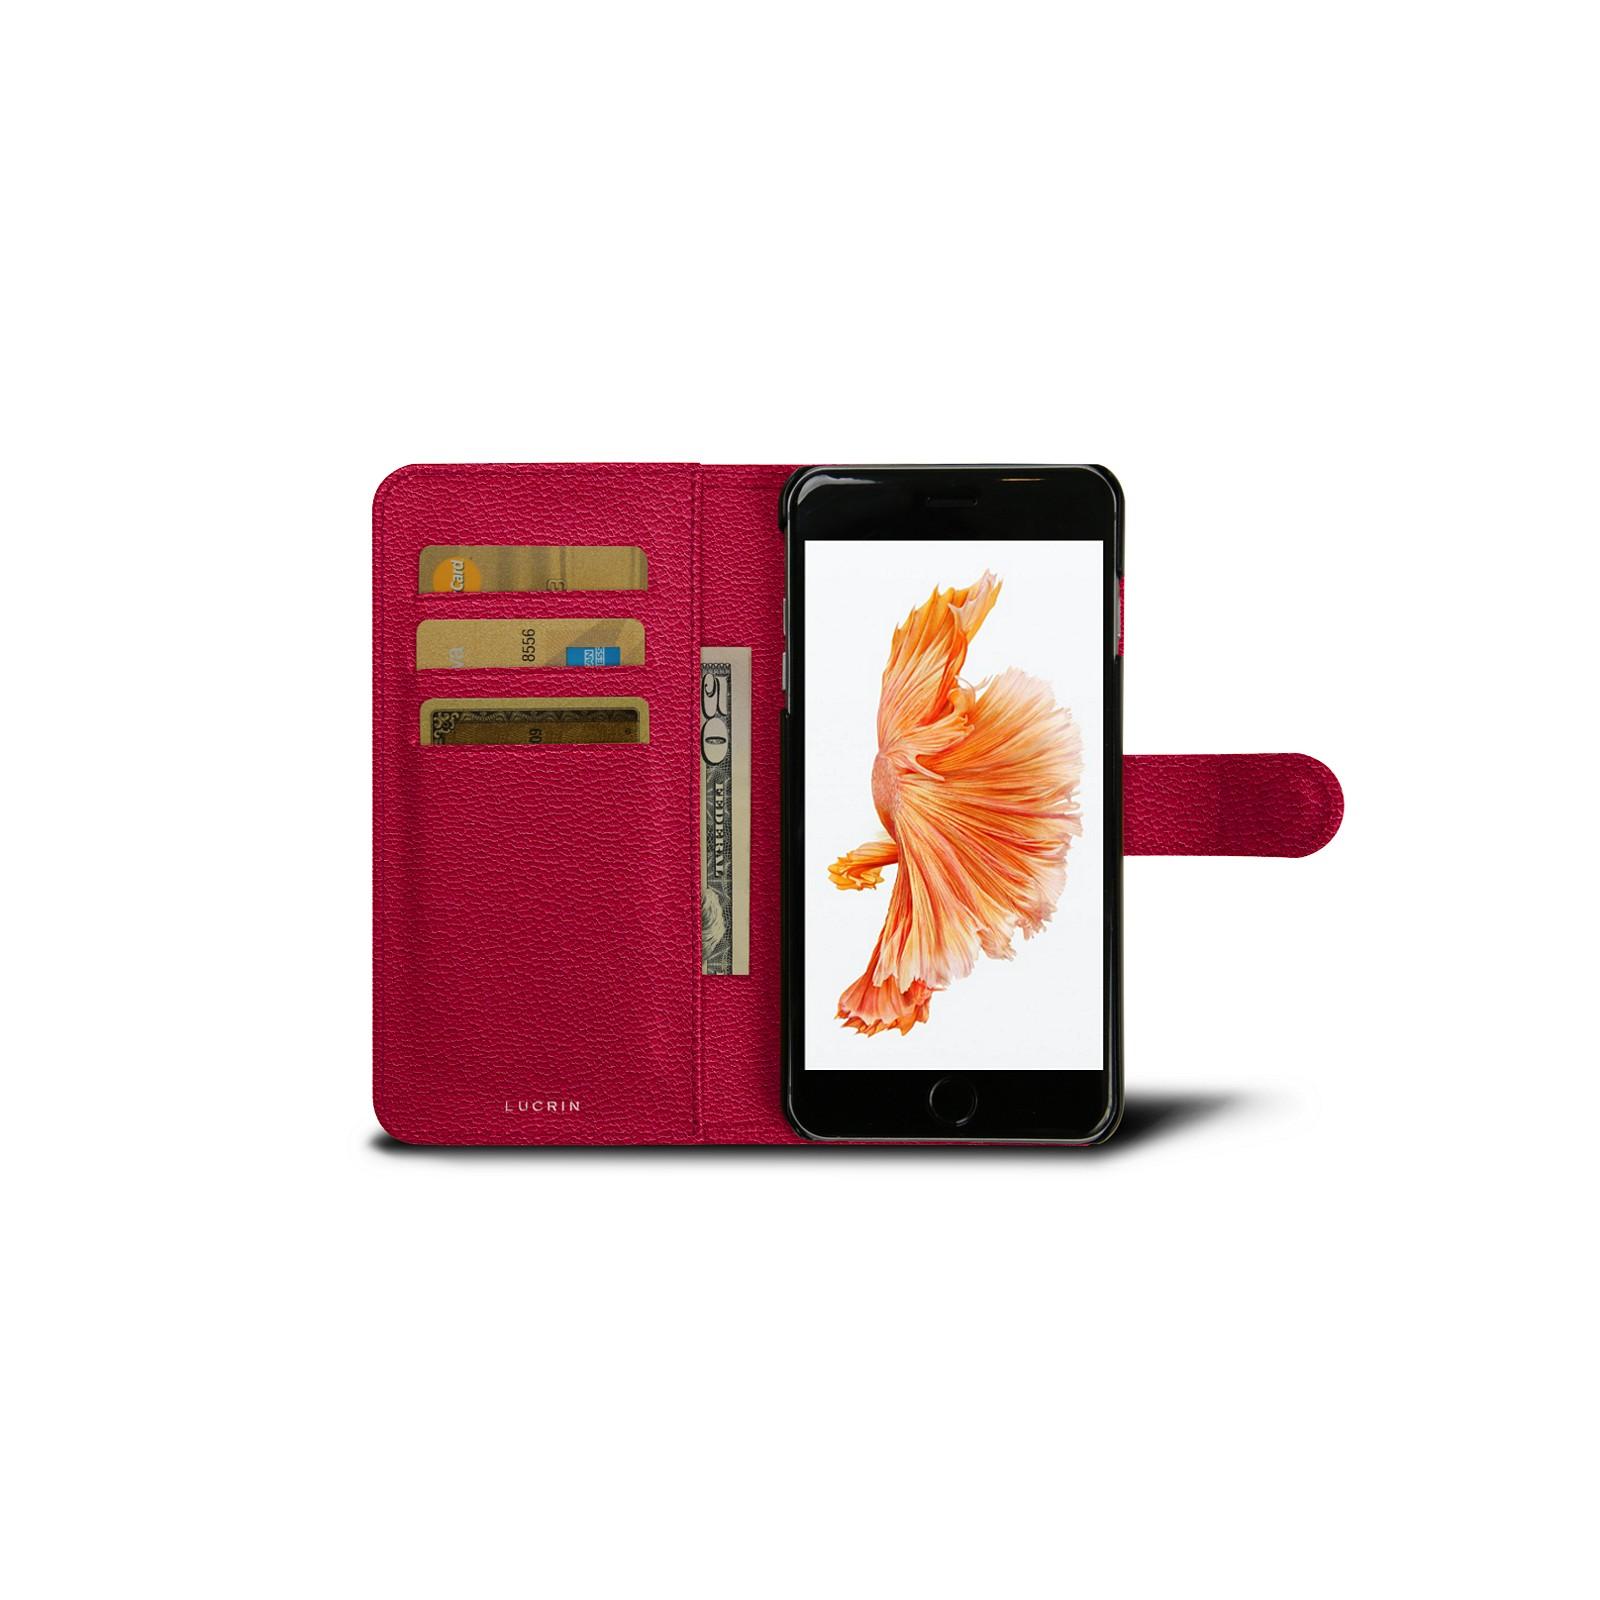 feeb8fb8d17 Funda tipo cartera para iPhone 6/6s Plus Fuchsia - Piel de Cabra Funda tipo cartera  para iPhone 6/6s Plus Fuchsia - Piel de Cabra 